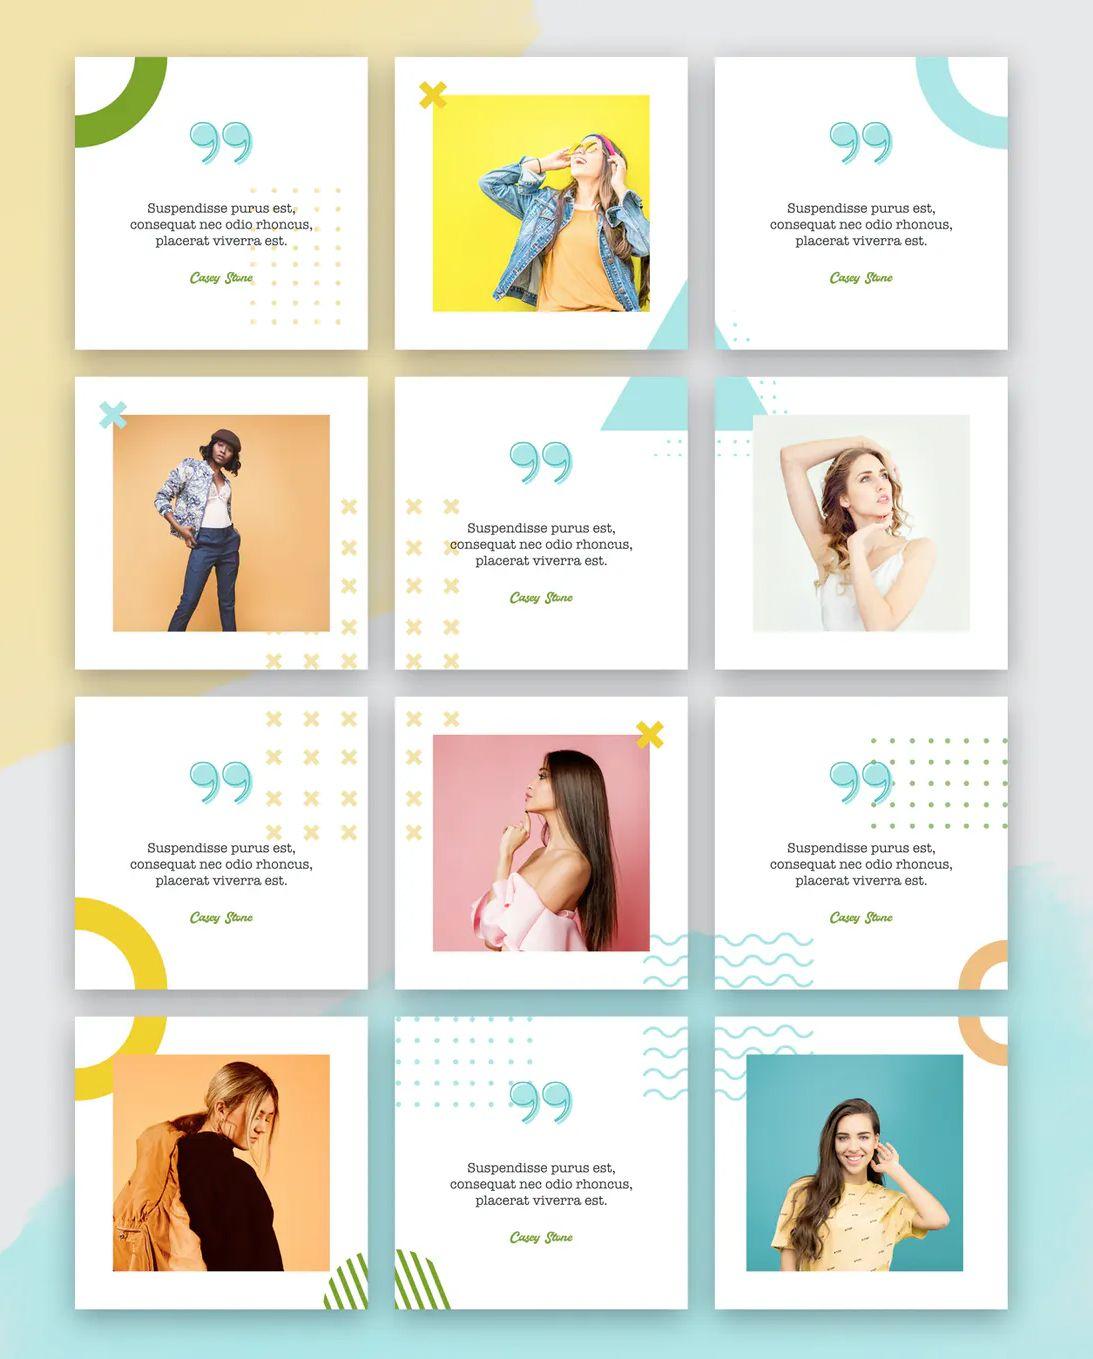 Fashion Instagram Puzzle Templates Psd In 2020 Social Media Design Graphics Instagram Template Design Instagram Design Layout